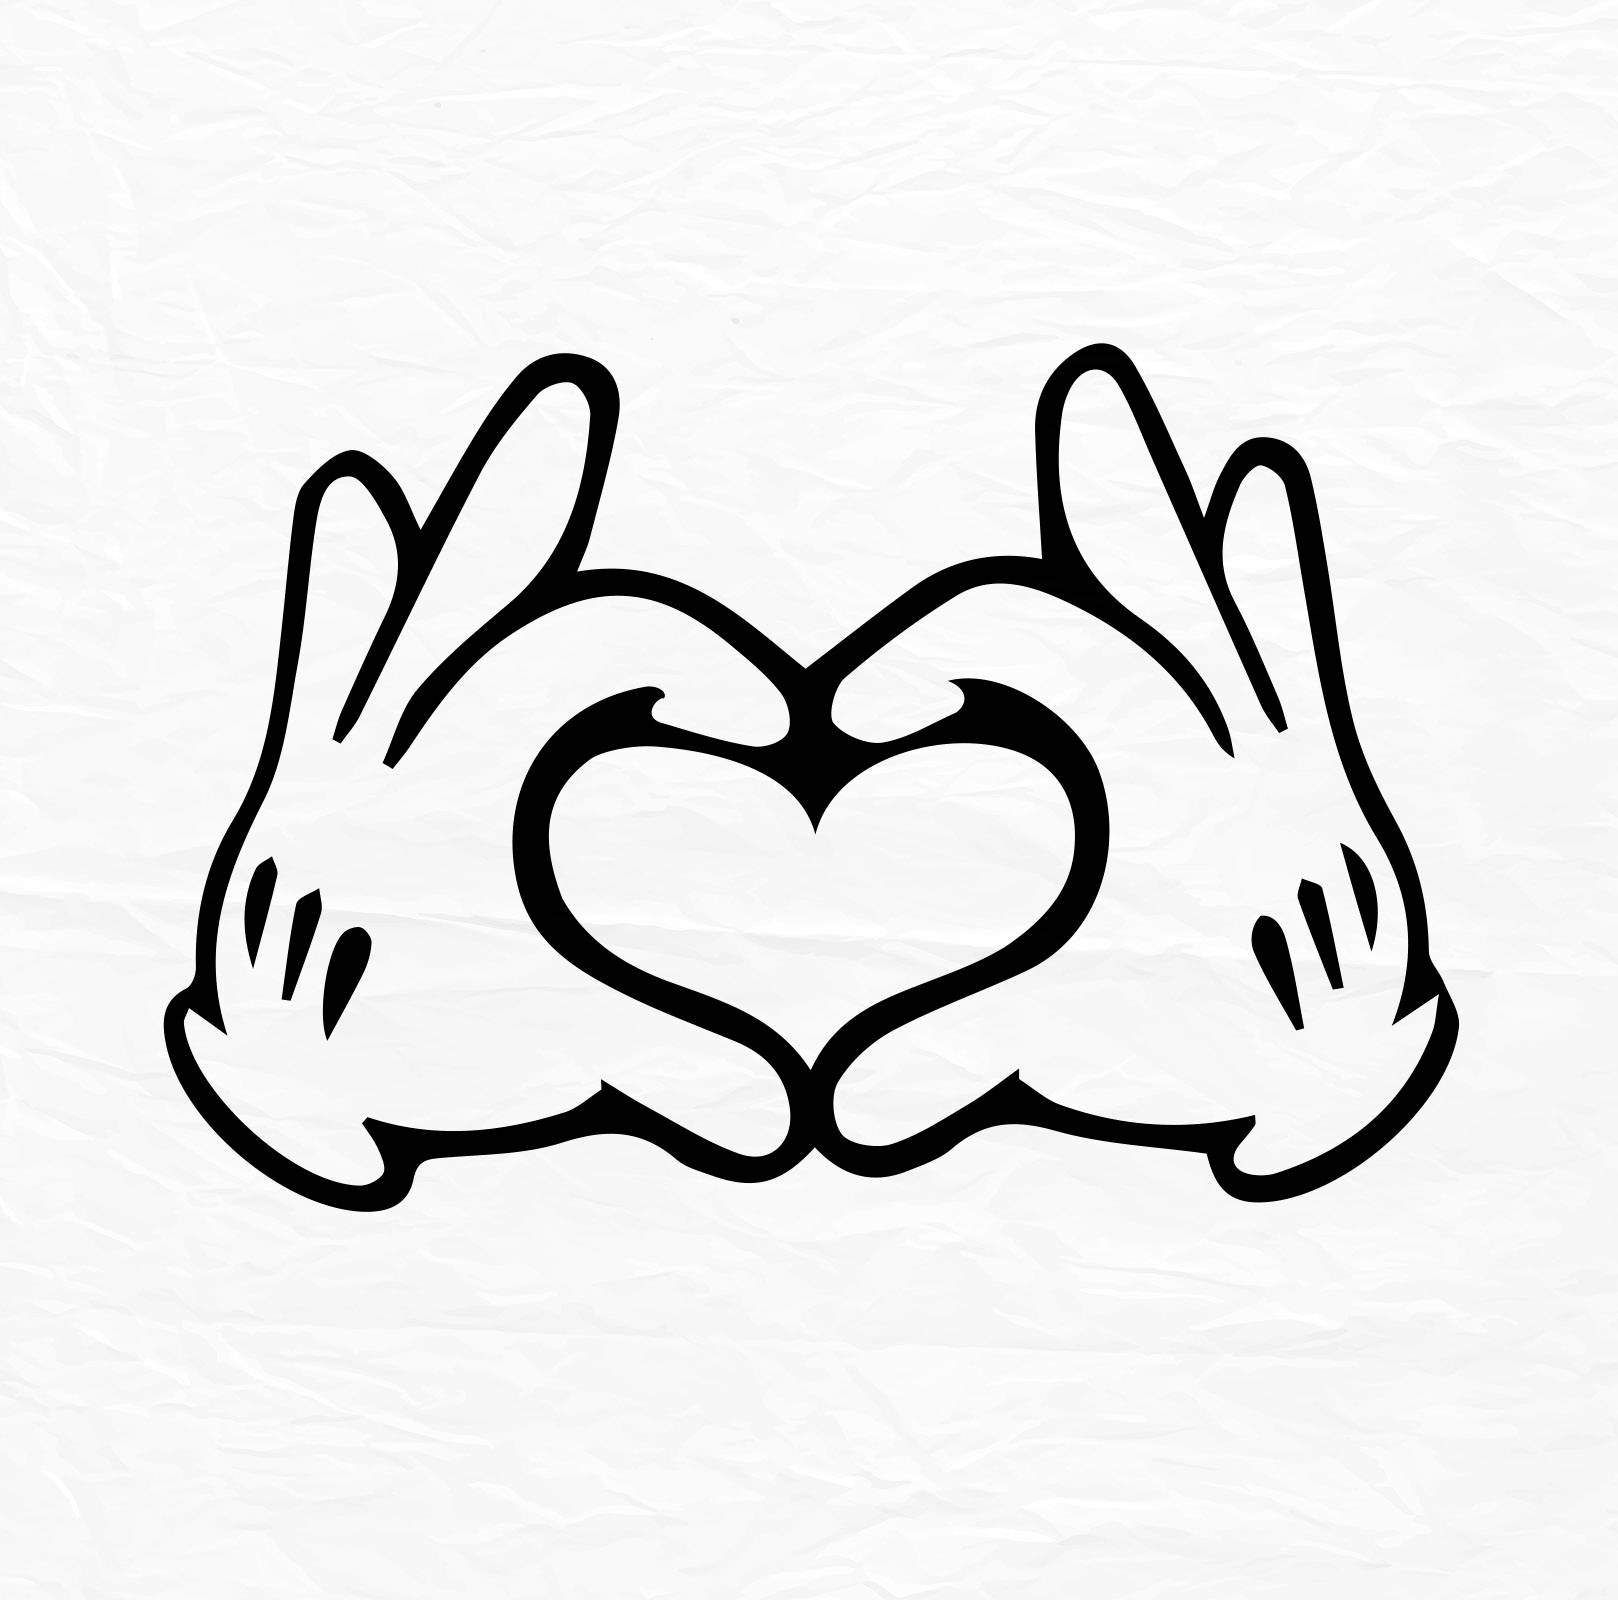 Glove Mouse Hand Heart Love Design Love SVG Disney Heart ...